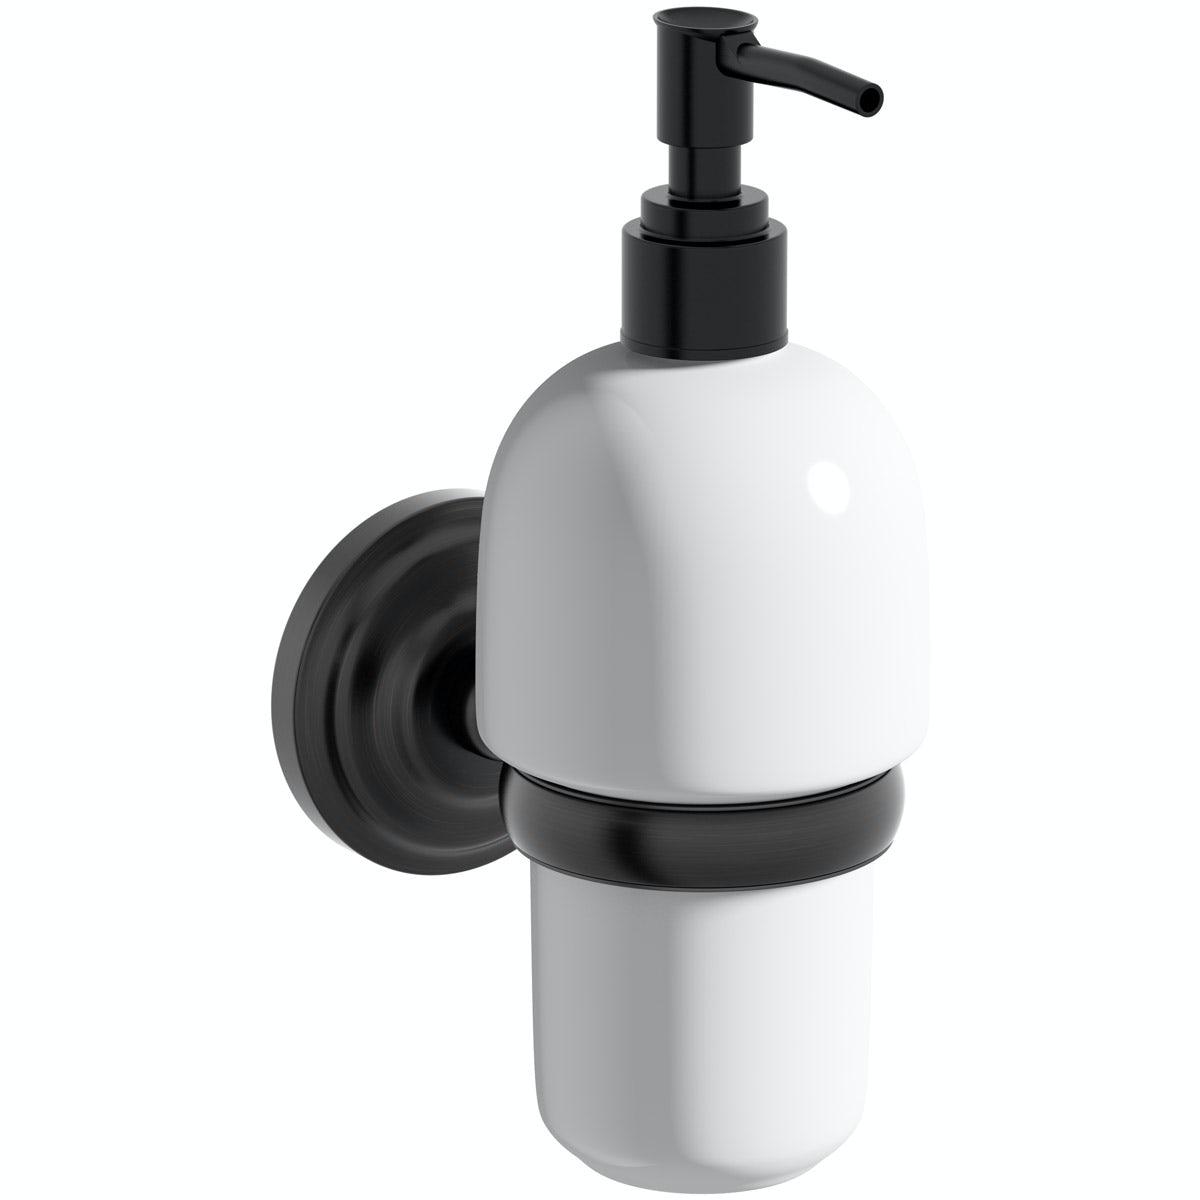 The Bath Co. 1805 black soap dispenser and holder